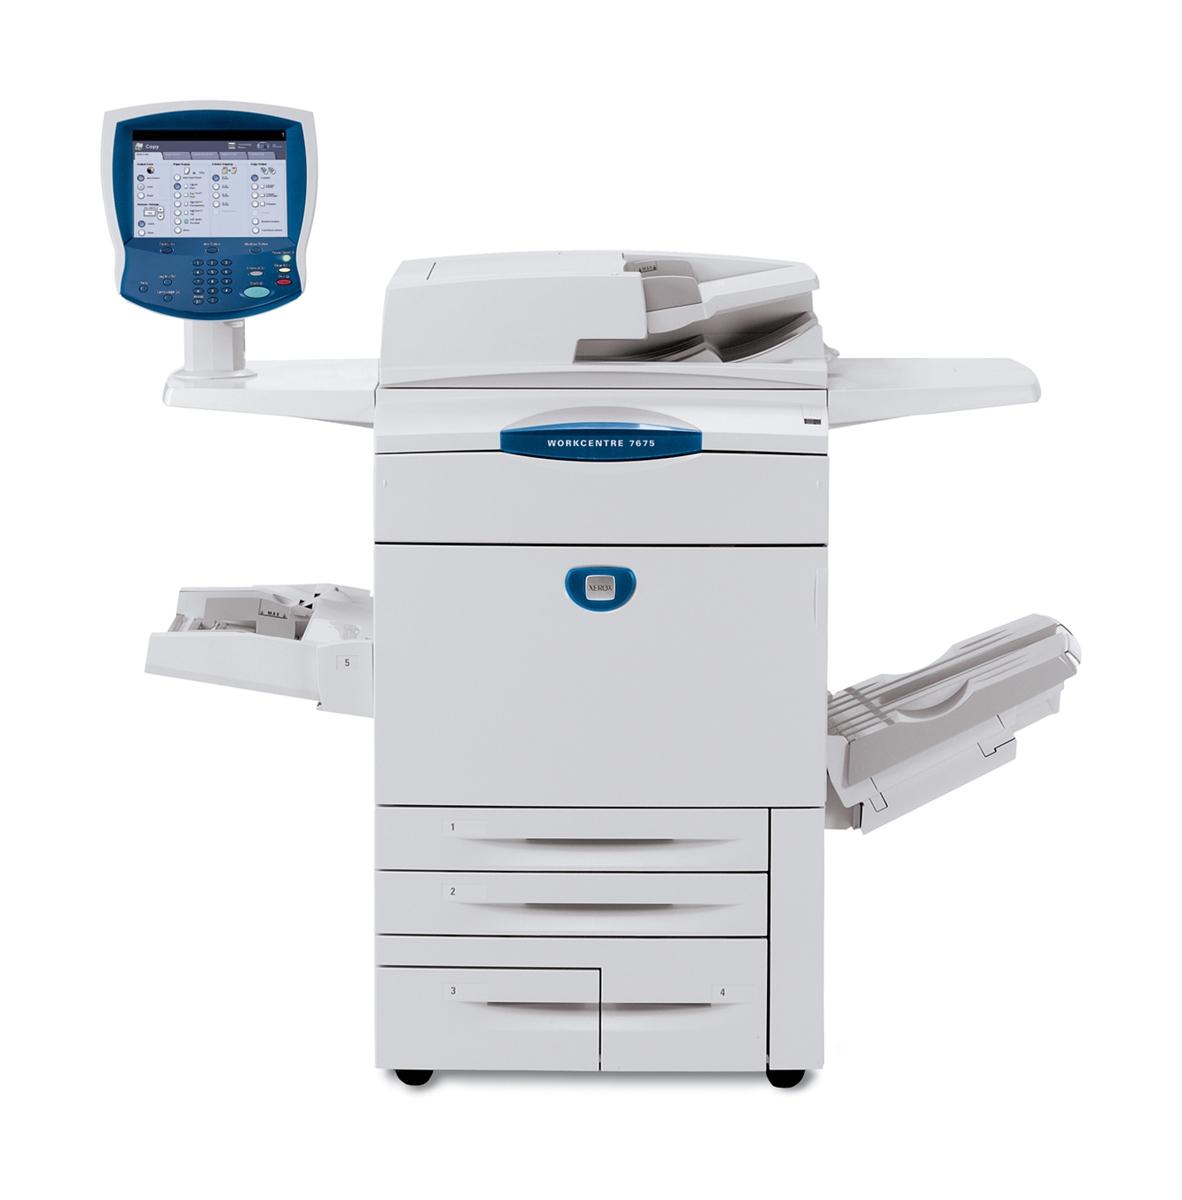 Xerox WorkCentre 7655 A3 Laser Copier